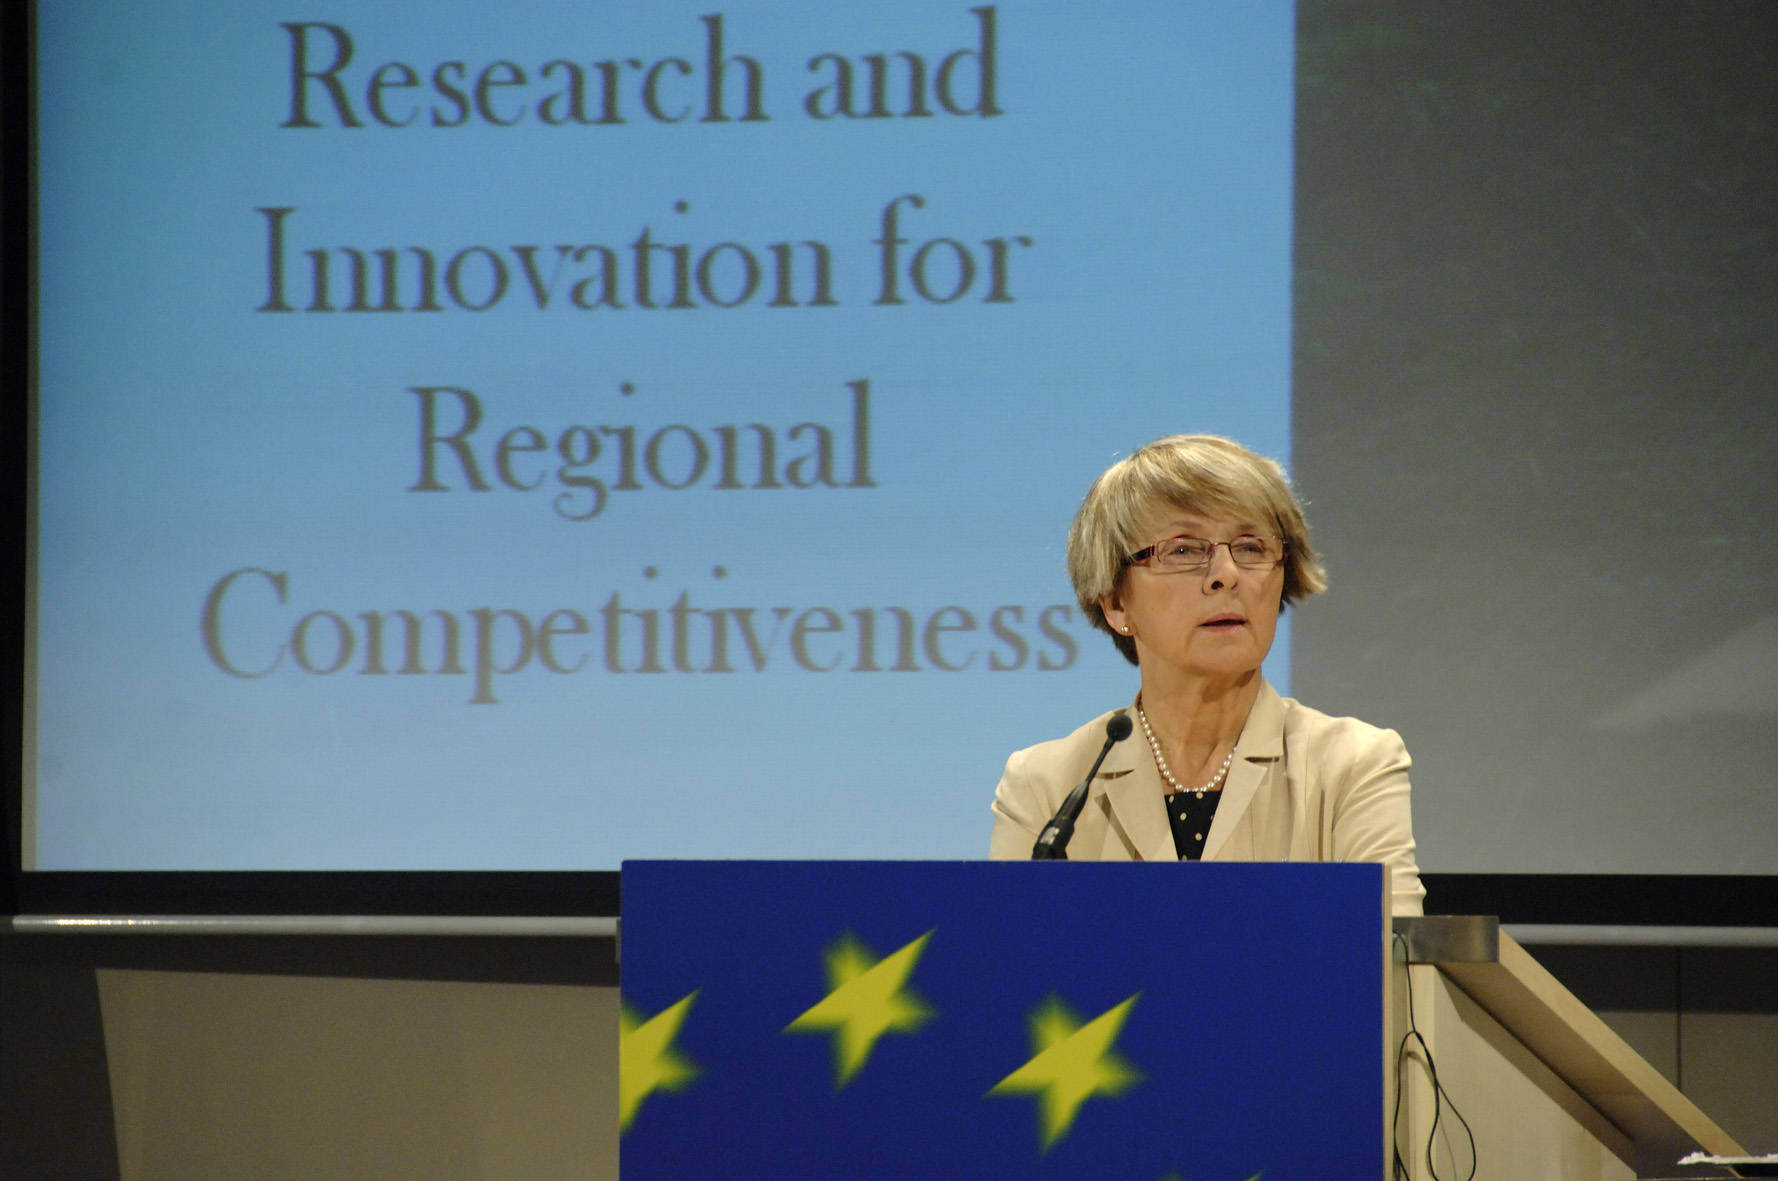 Press conference by Danuta Hübner and Janez Potocnik on the